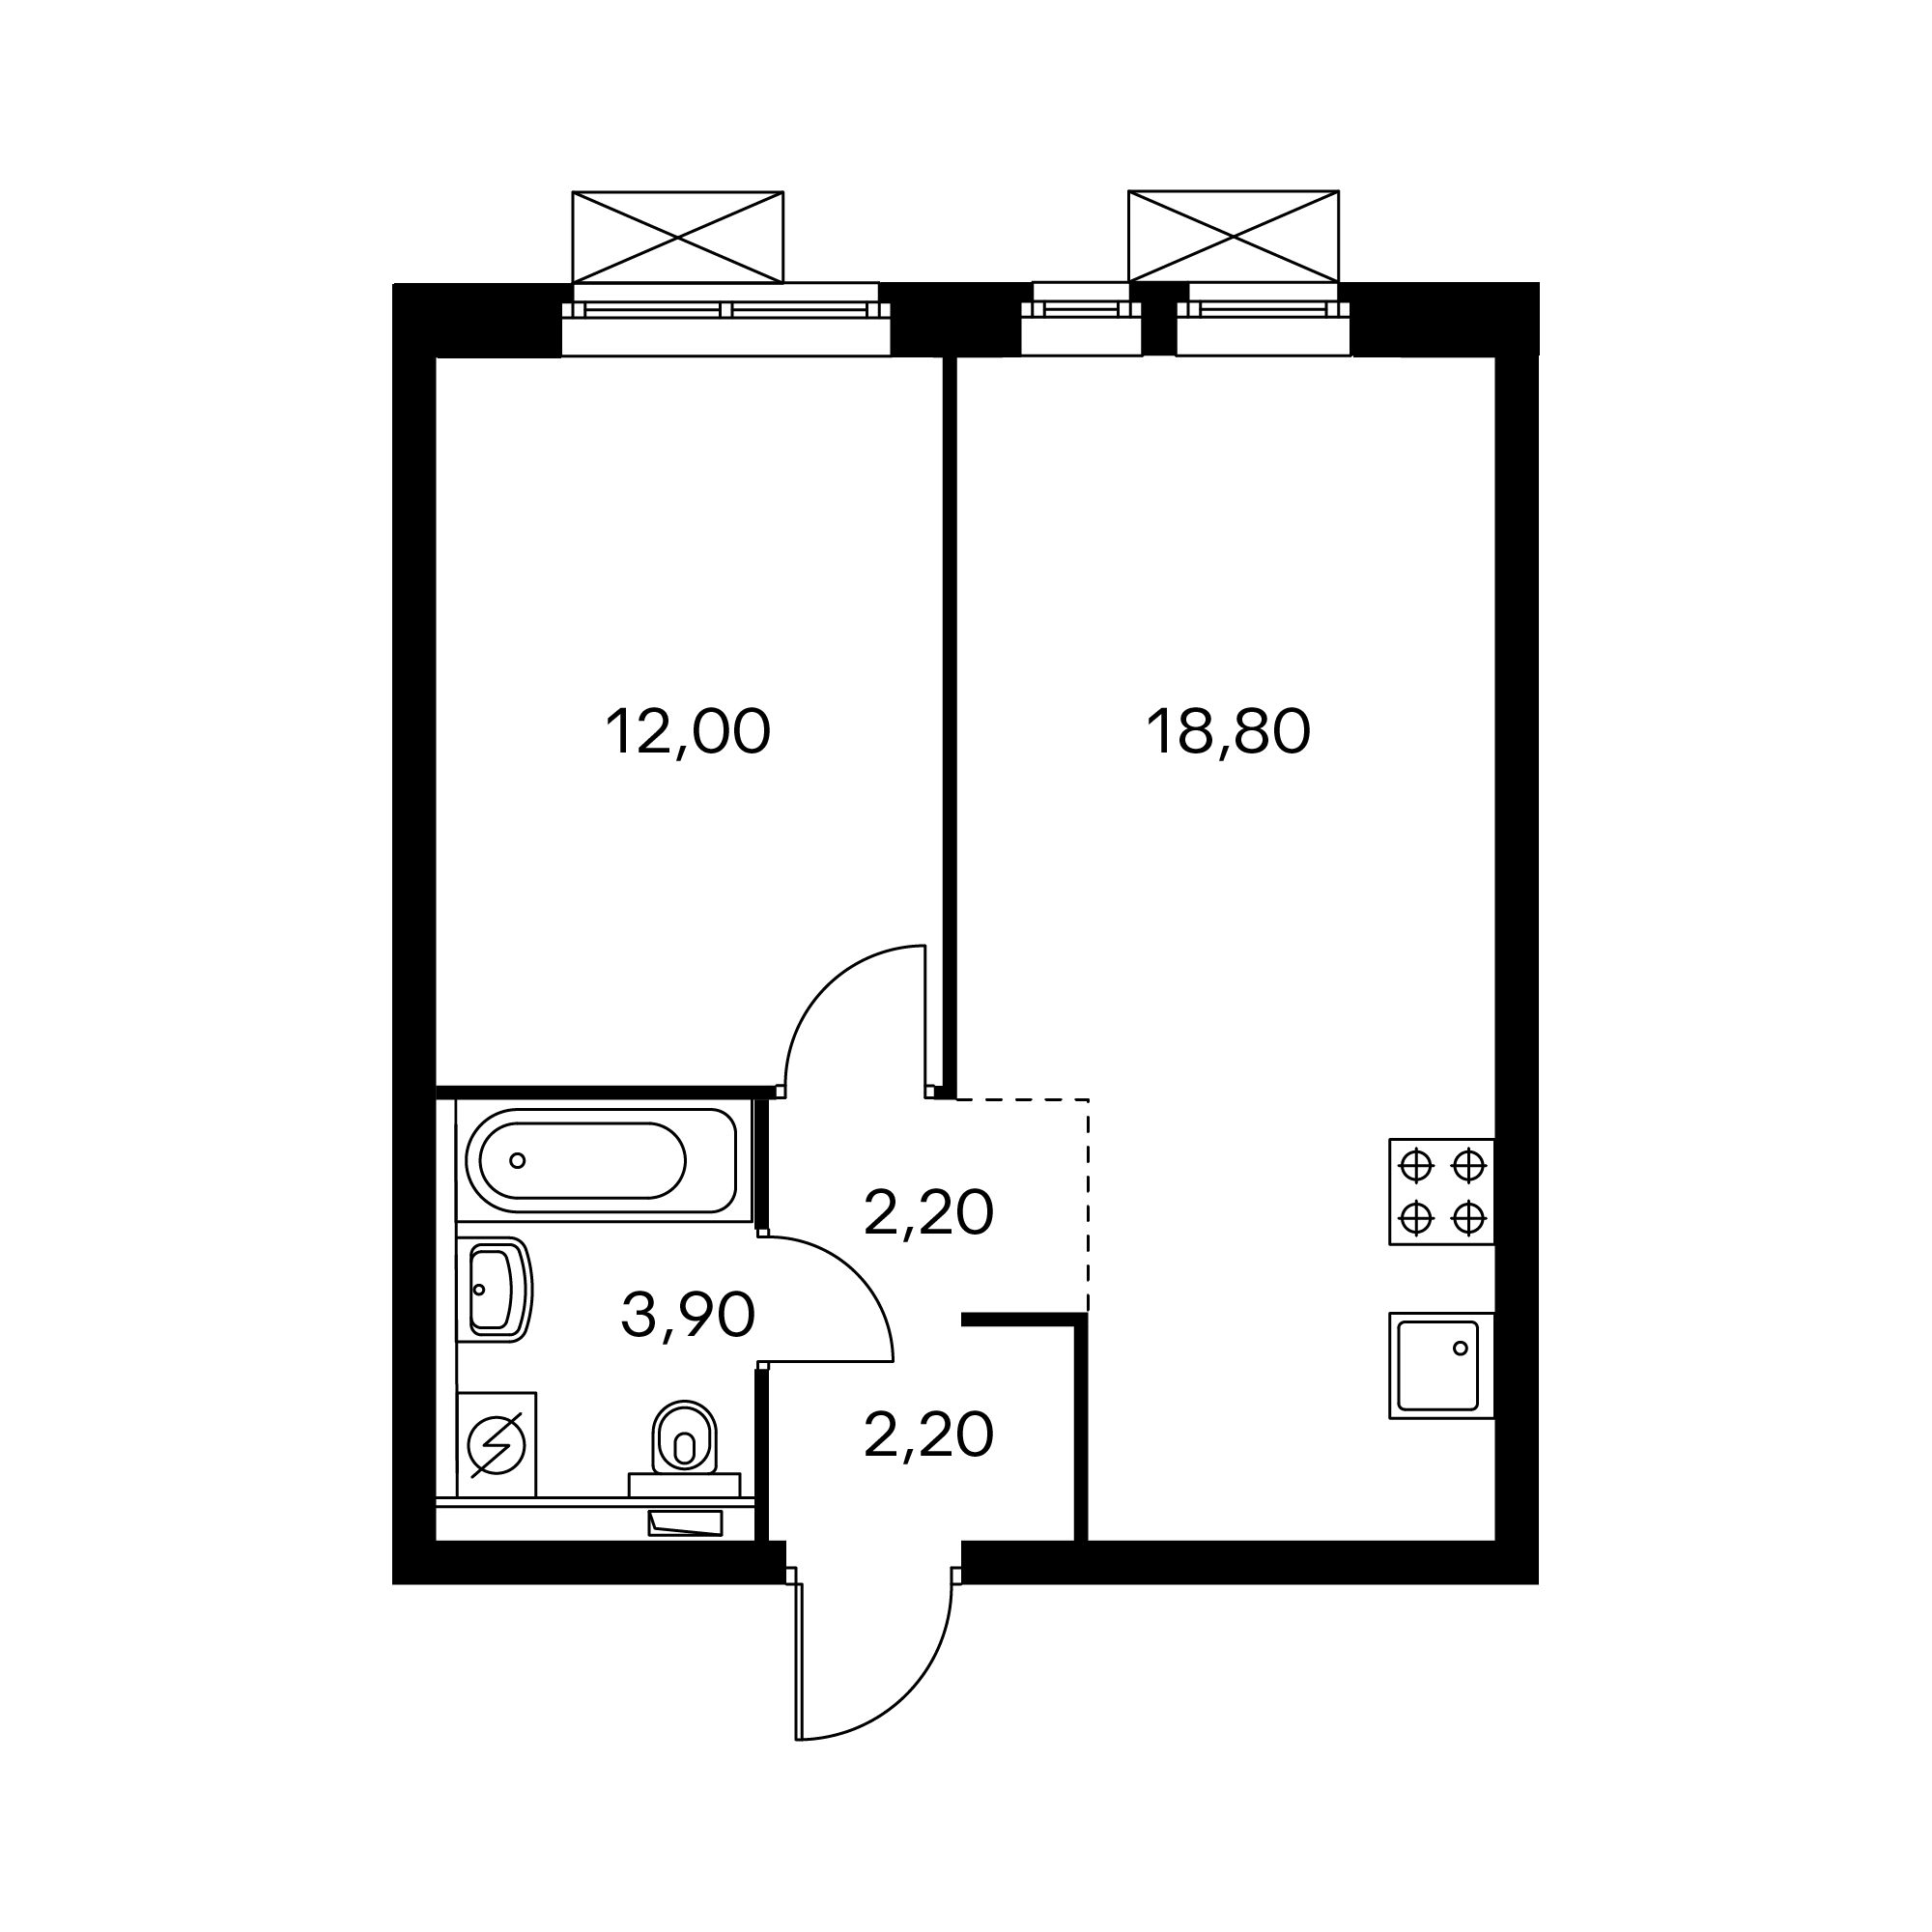 1EM1_6.3-1